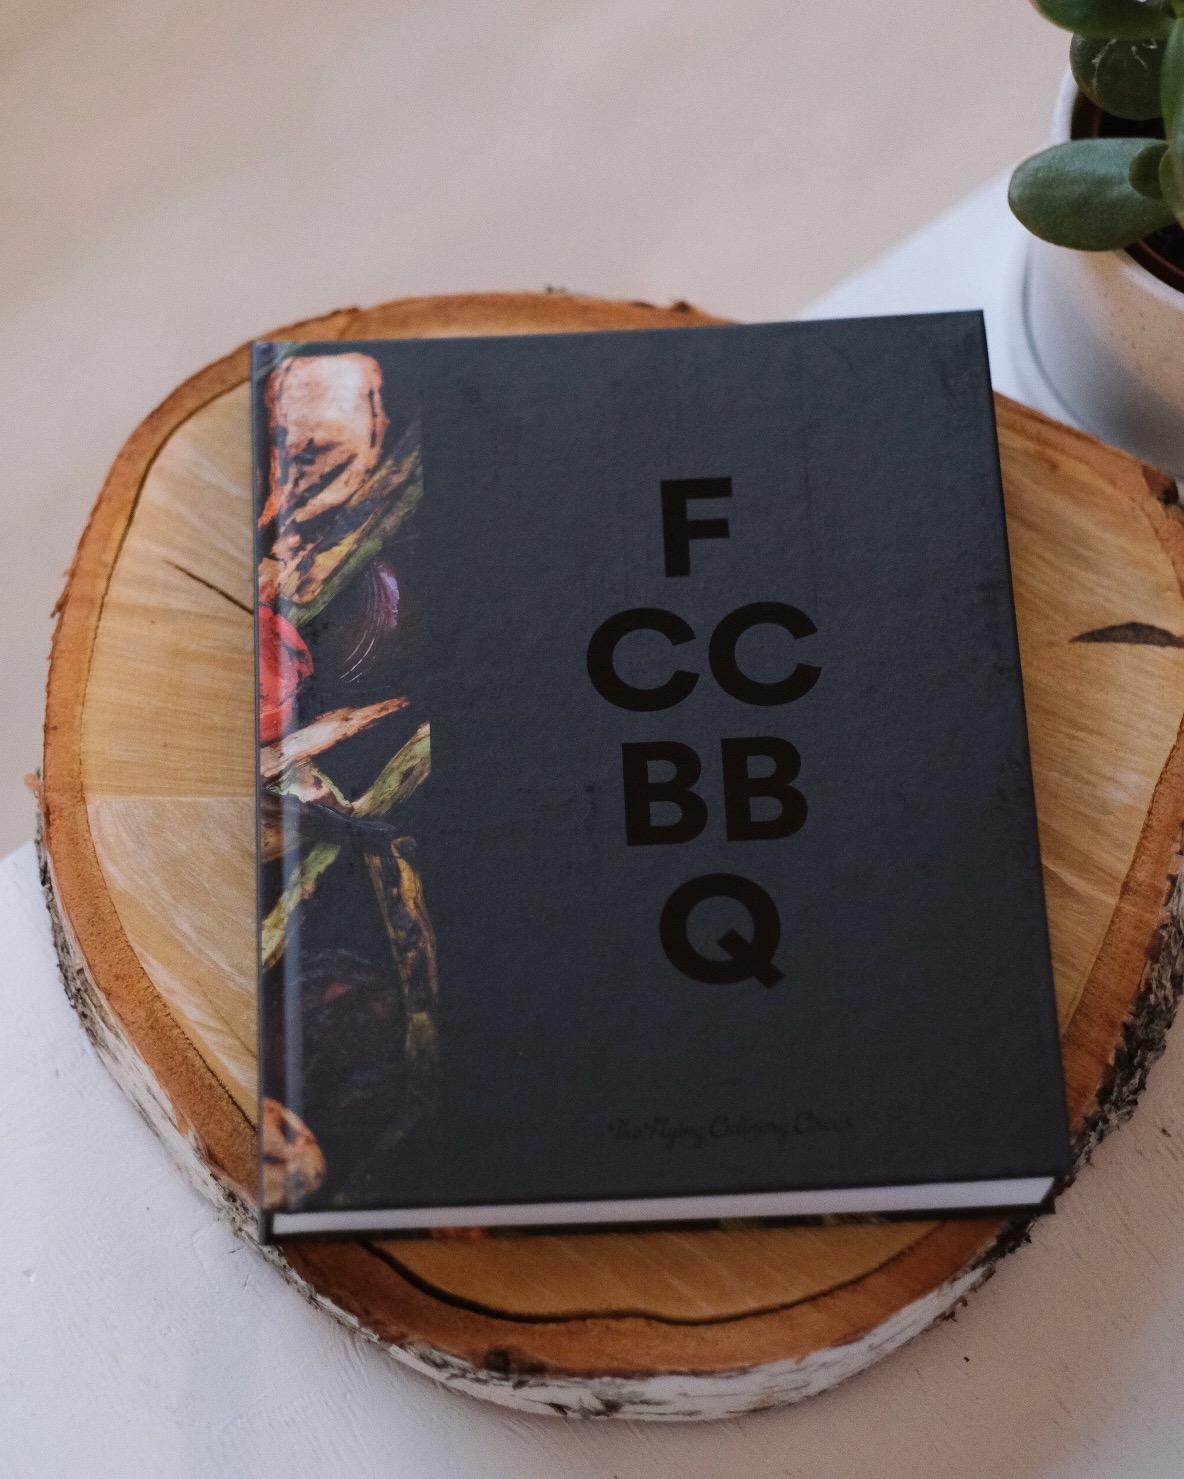 fcc-bbq-bok-produkt